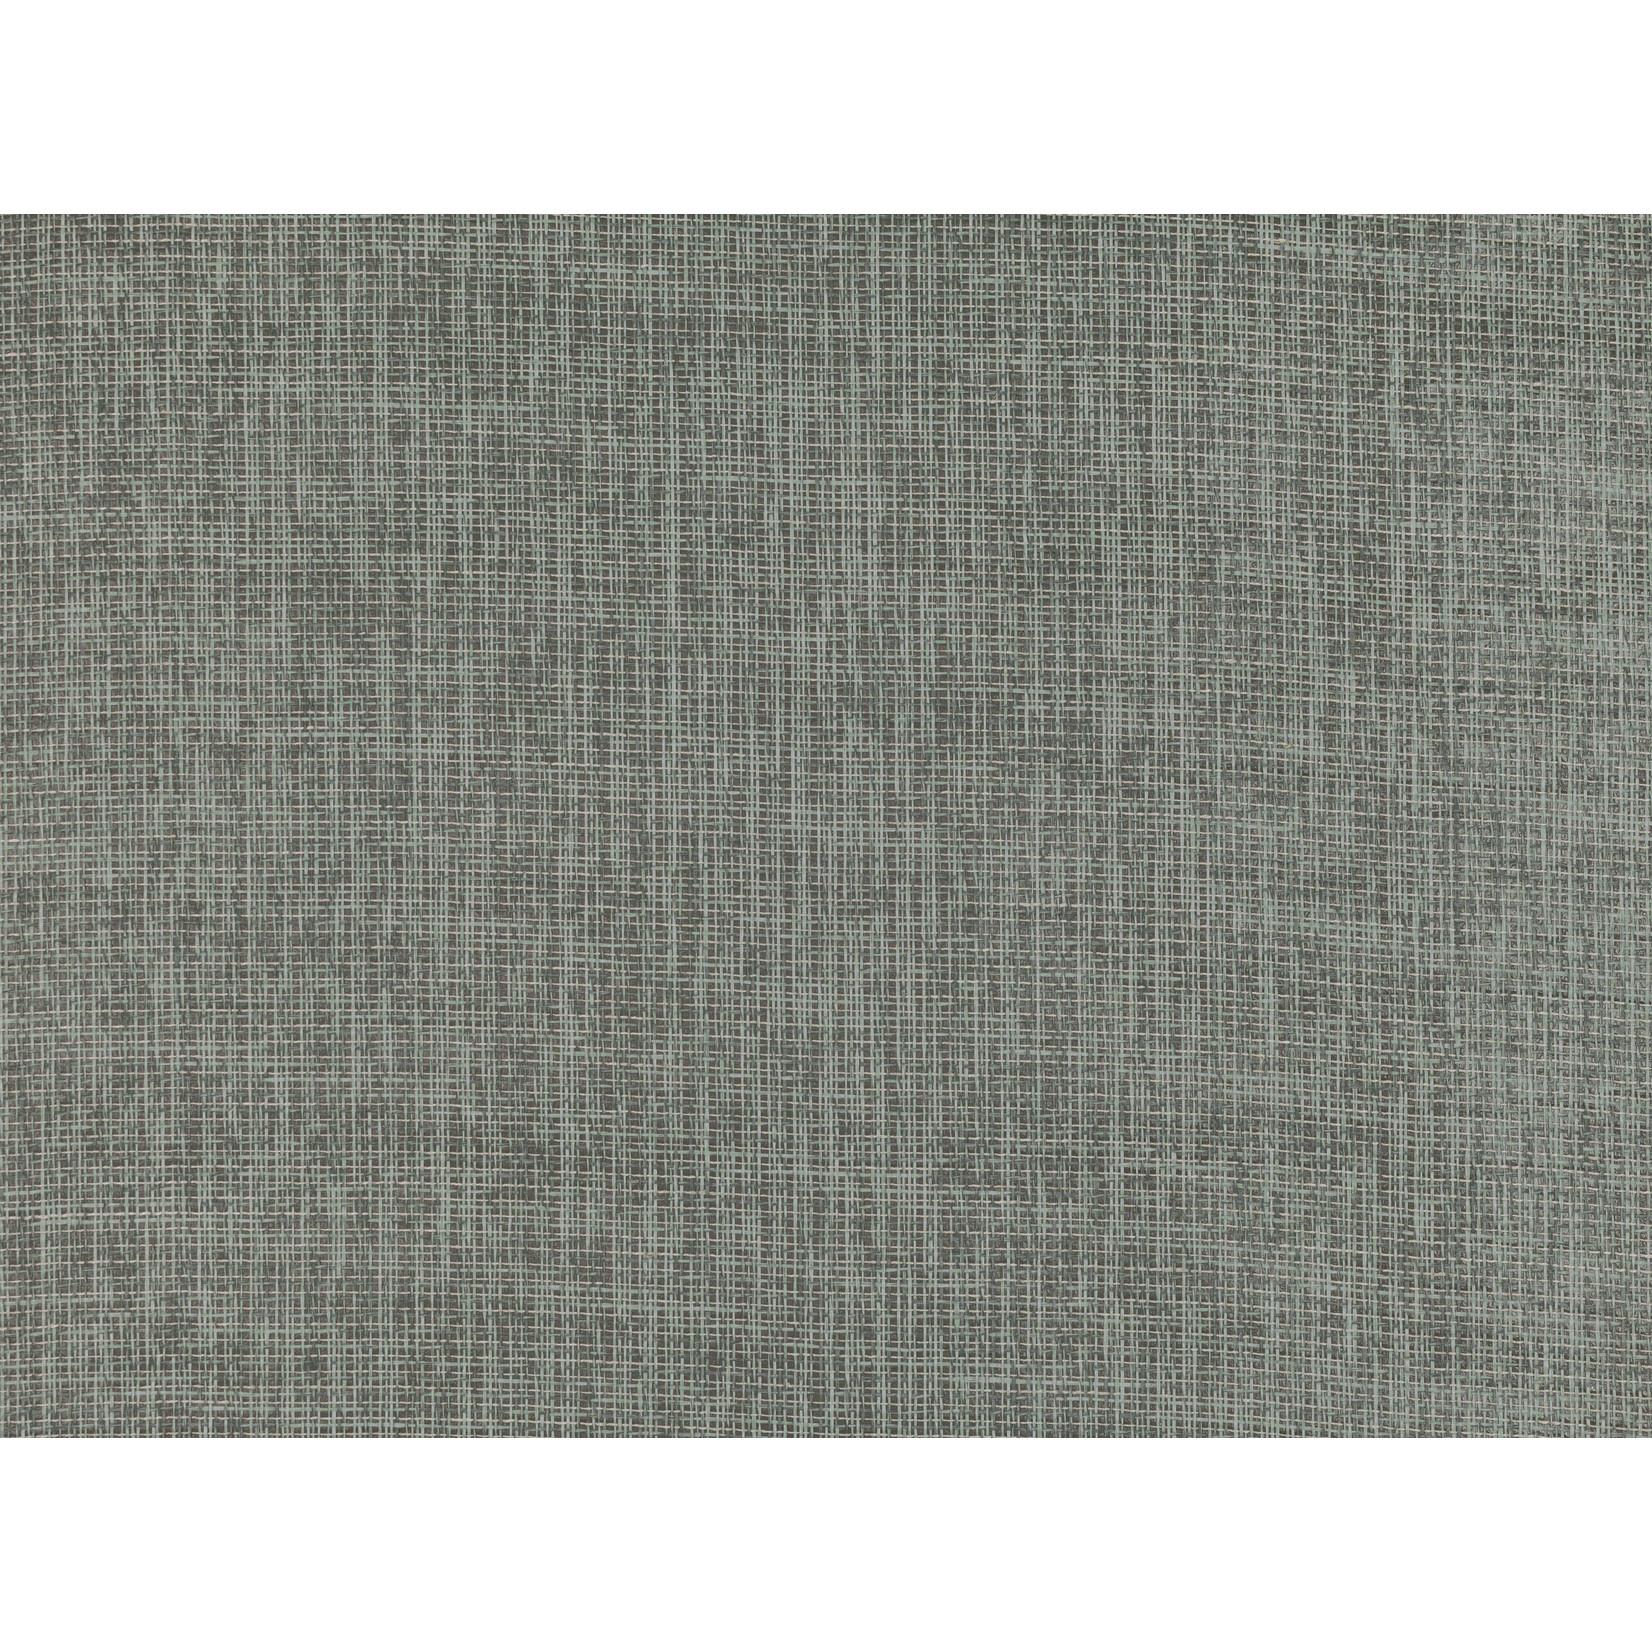 Mark Alexander Paperweave Handwoven Wallcoverings   Kami Tempest